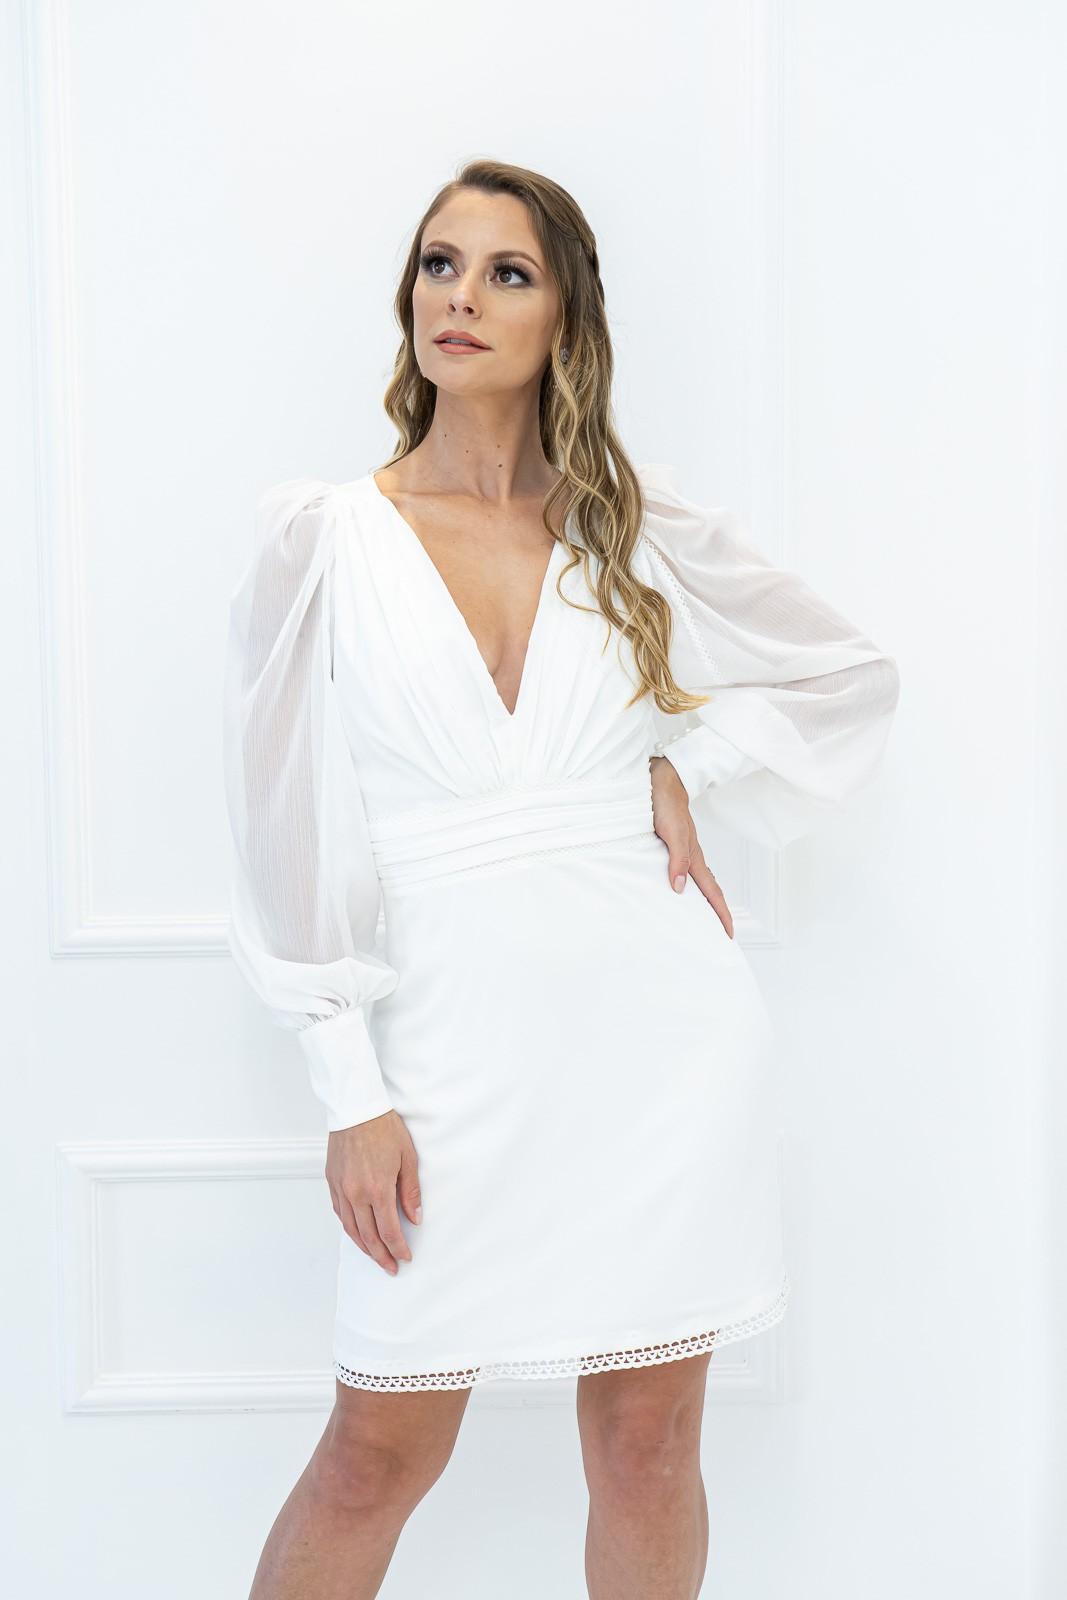 Vestido Latte Branco Curto Manga longa